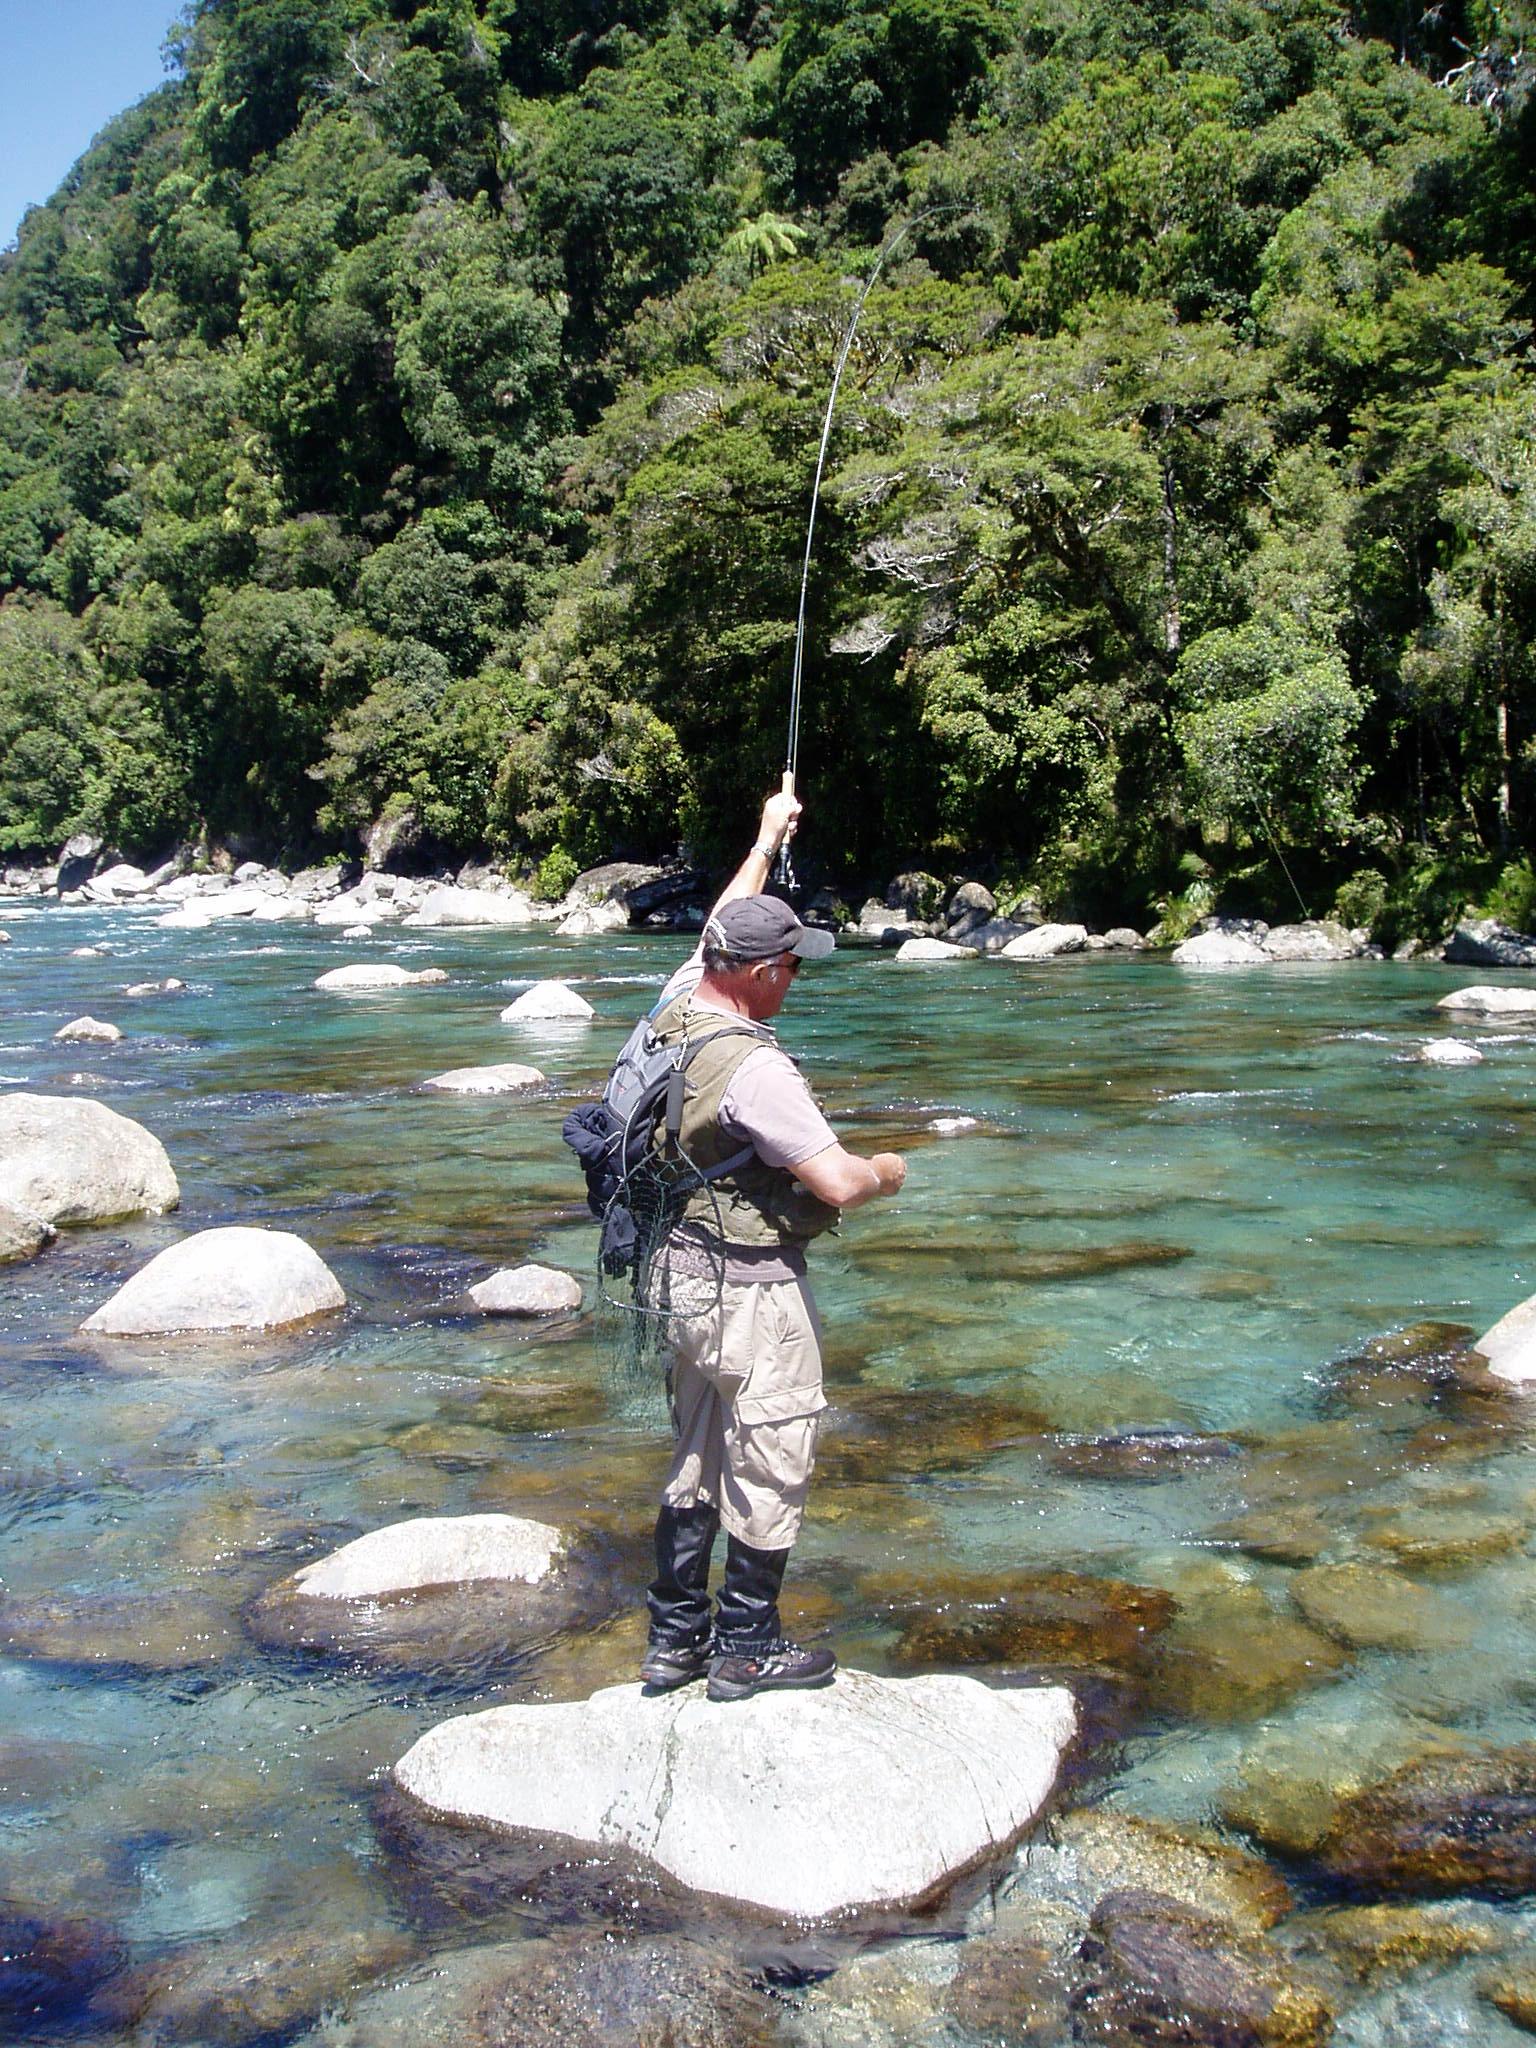 Fly fishing New Zealand adventures